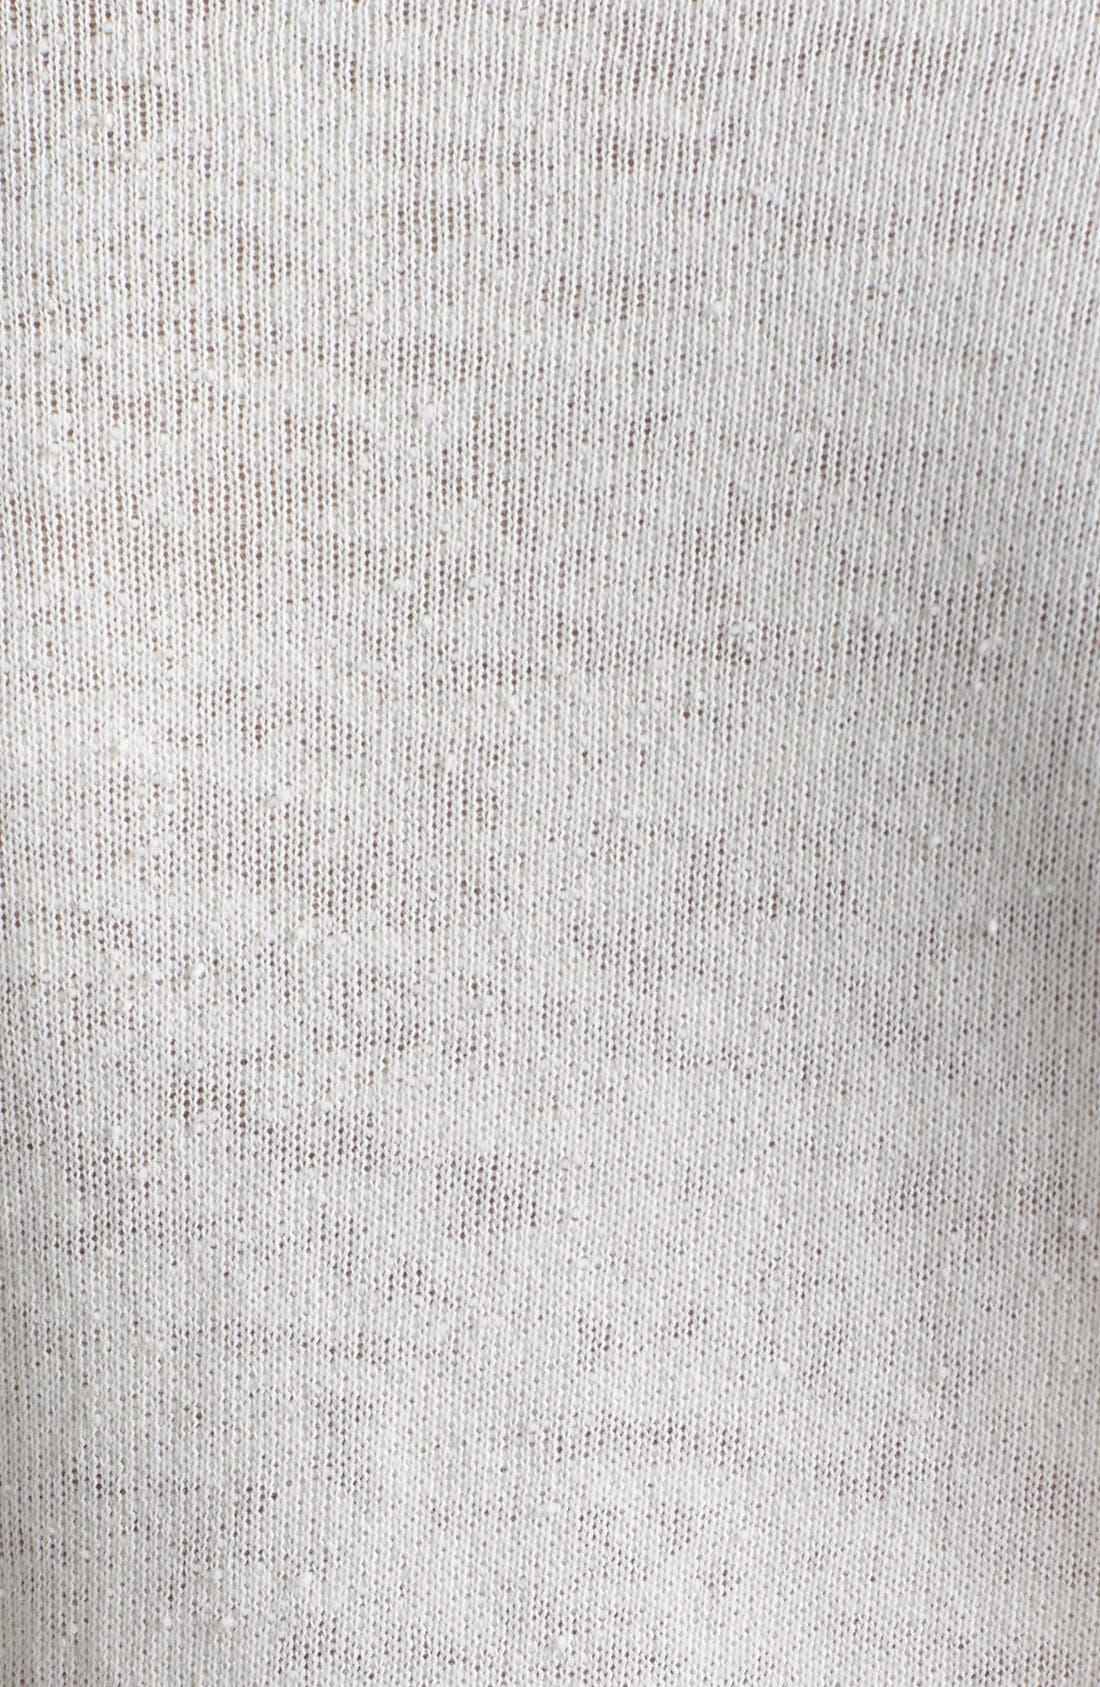 Alternate Image 3  - Wildfox '1974 Nantucket' Sweatshirt